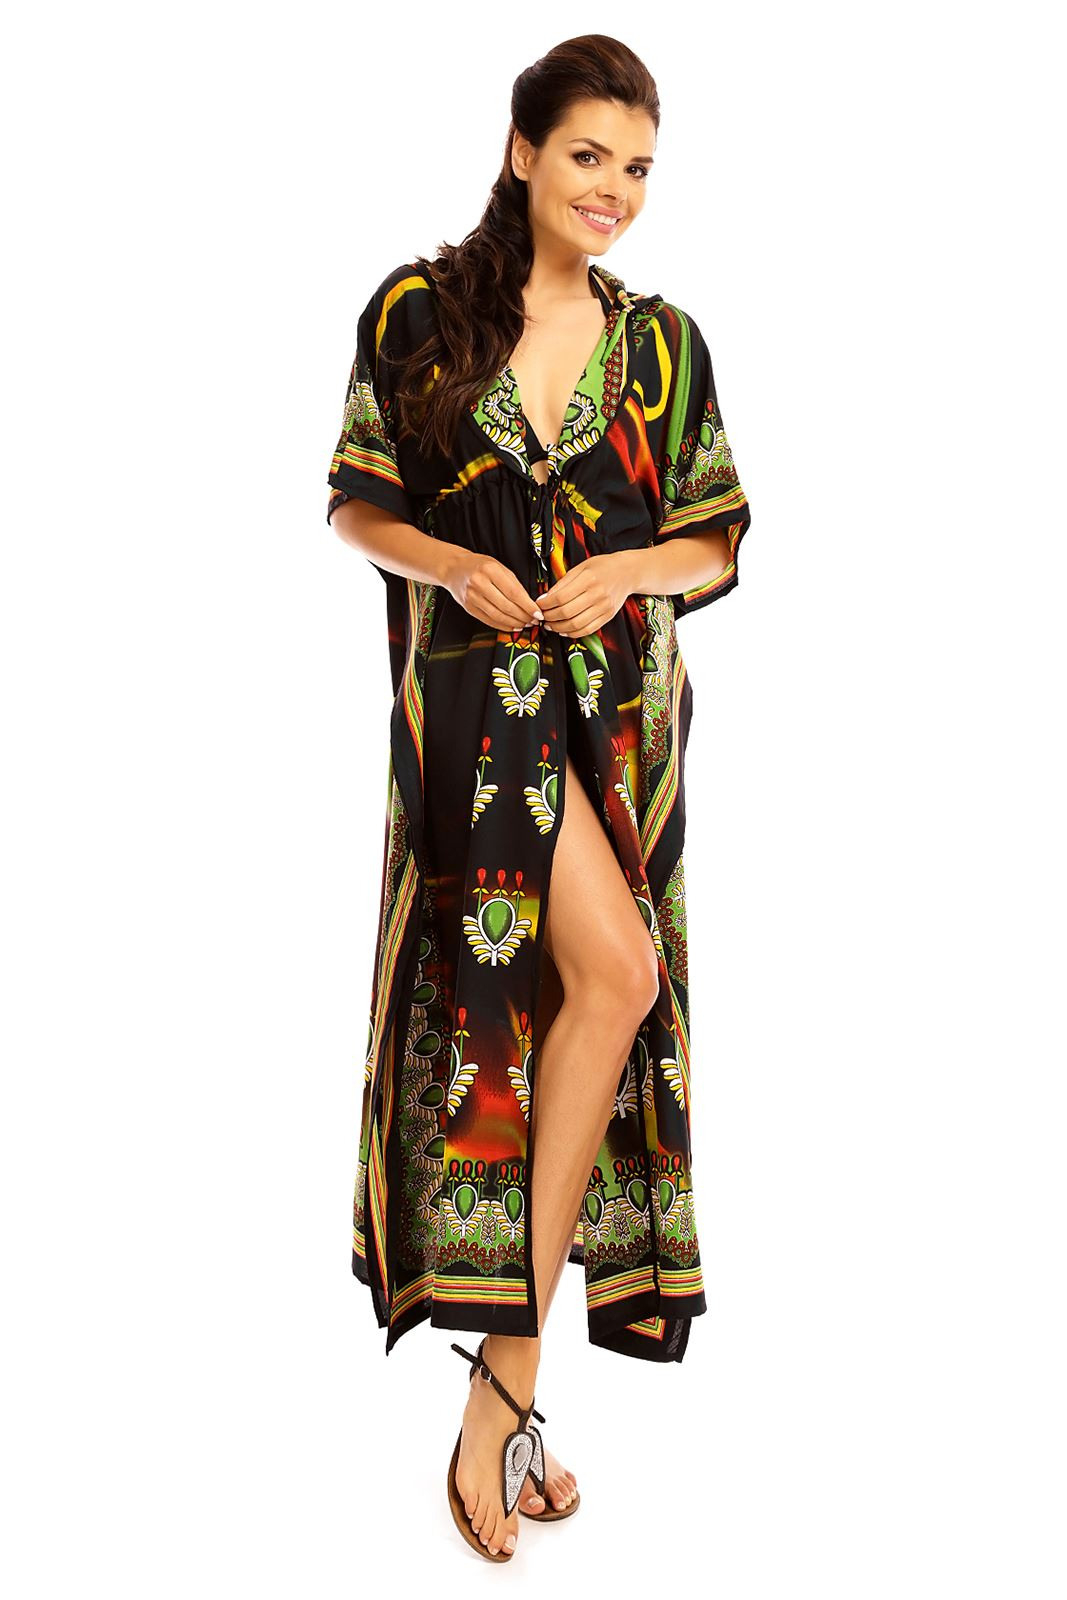 Langer Maxikimono Tunika Kaftan Mantel Kleid Für Frauen